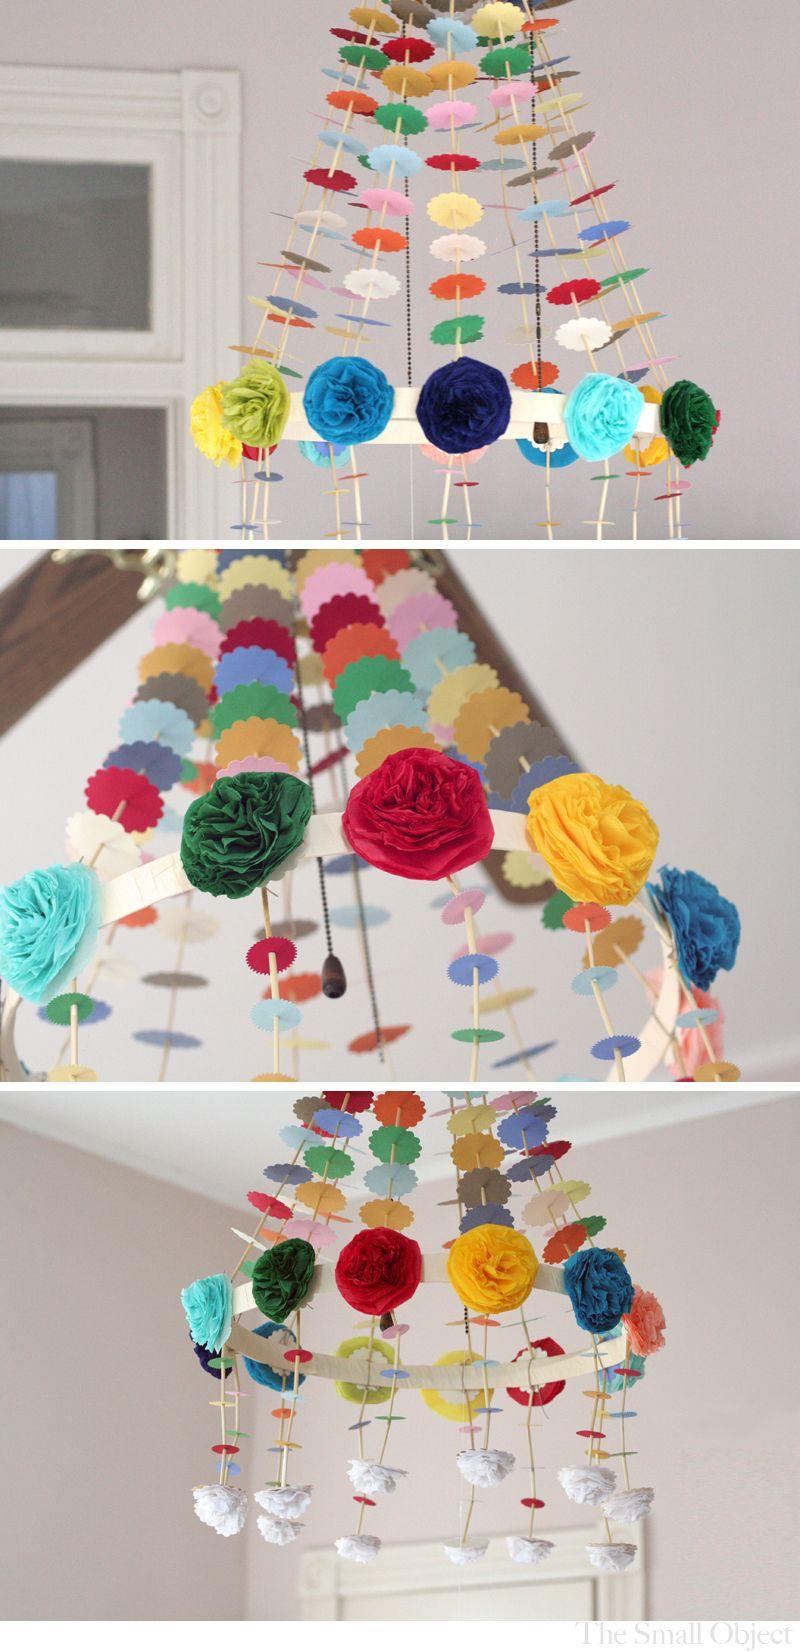 Polish Paper Chandeliers   Paper chandelier, Chandeliers and Craft for Paper Chandelier Craft  143gtk